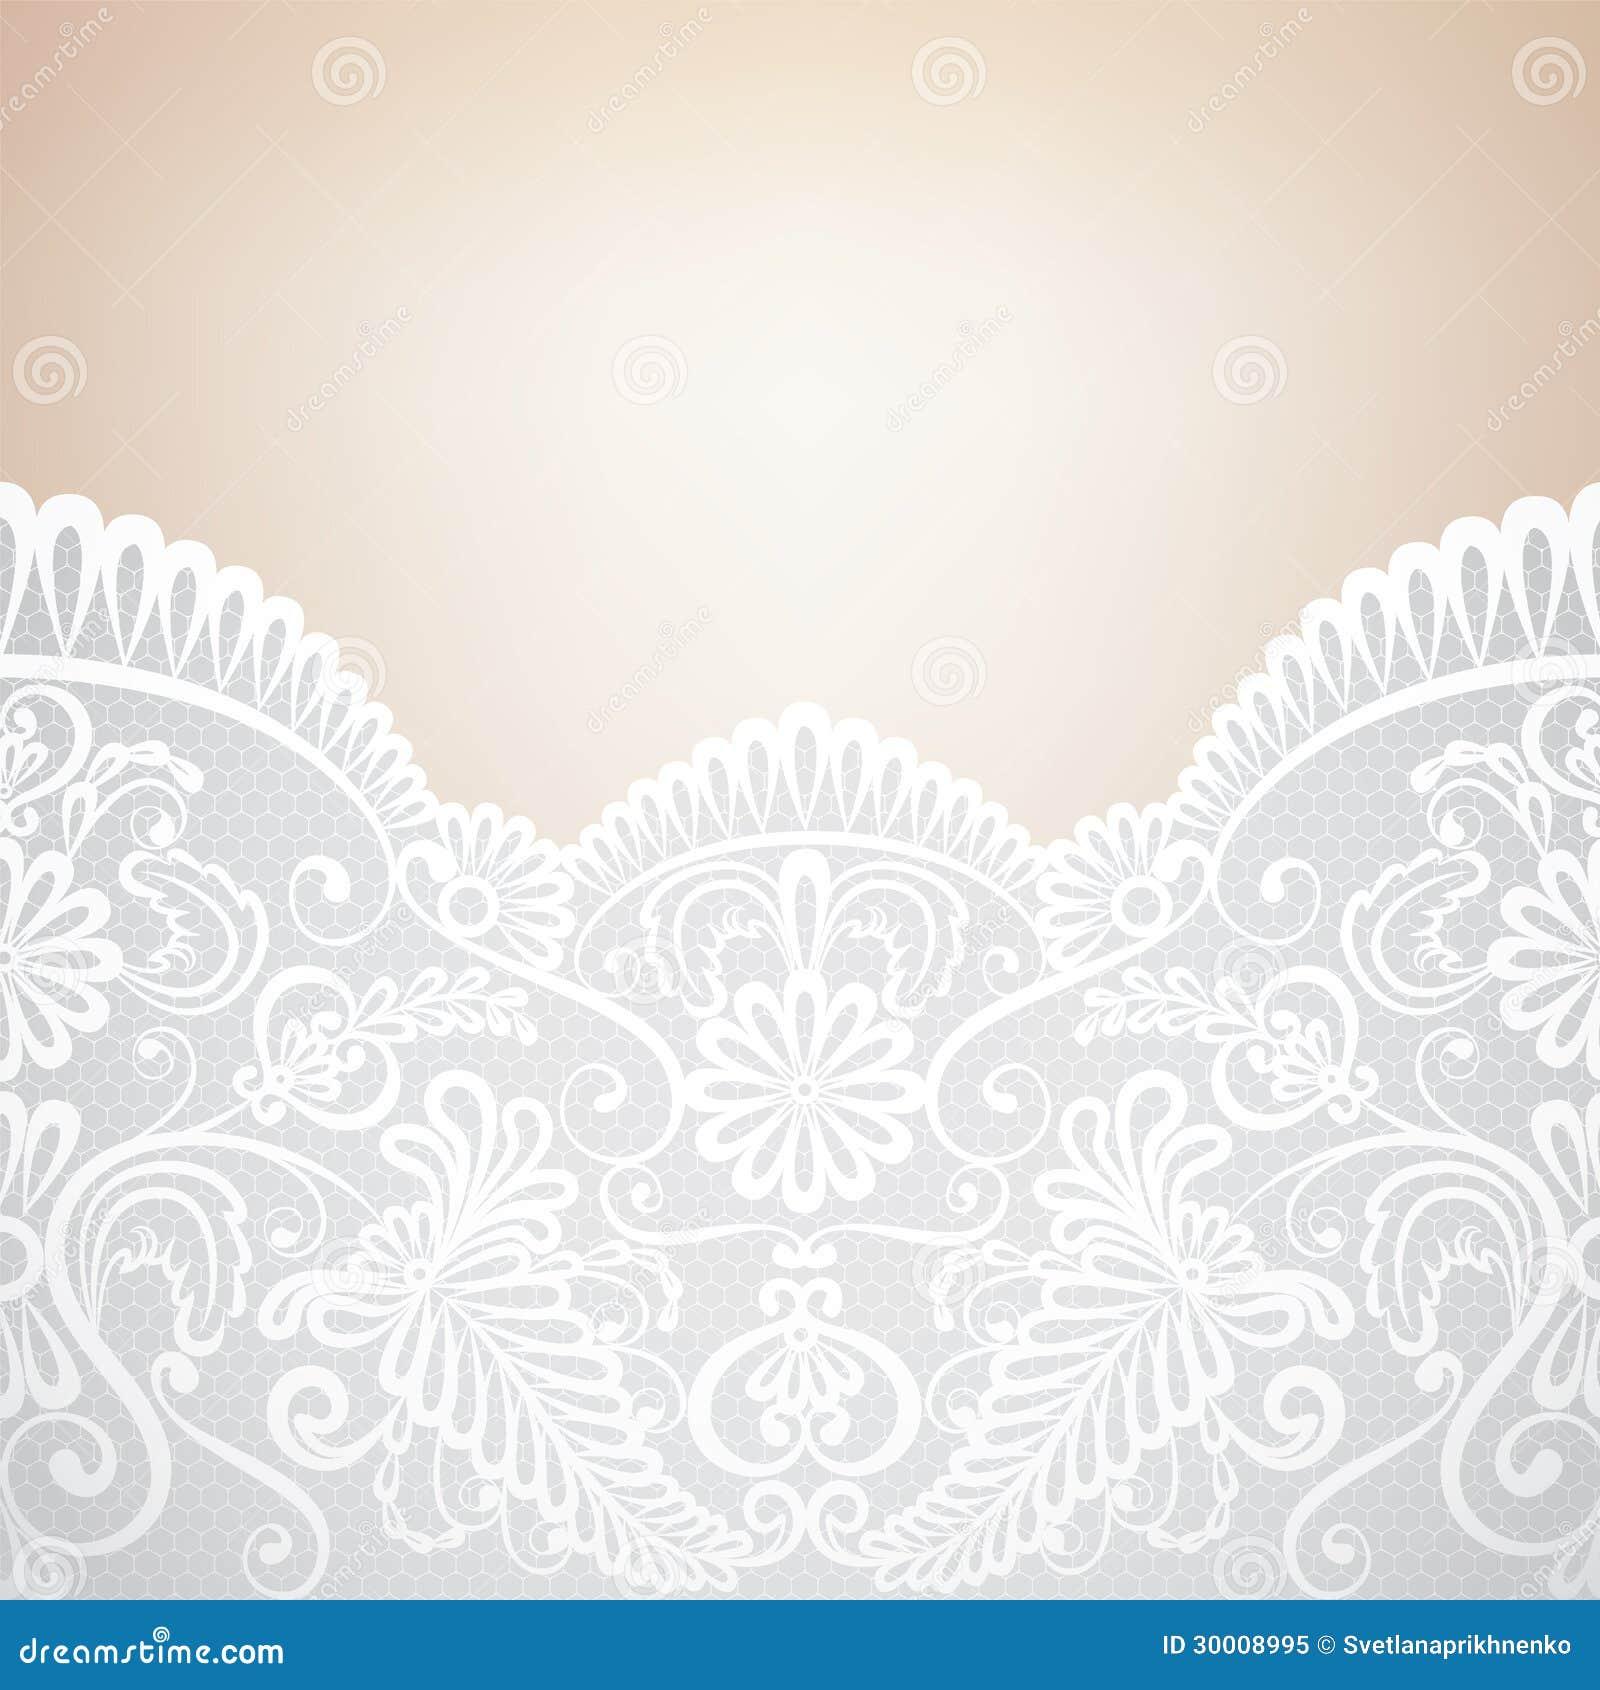 Border For Invitation Card Invitation Wedding Border: Wedding Card Royalty Free Stock Photo